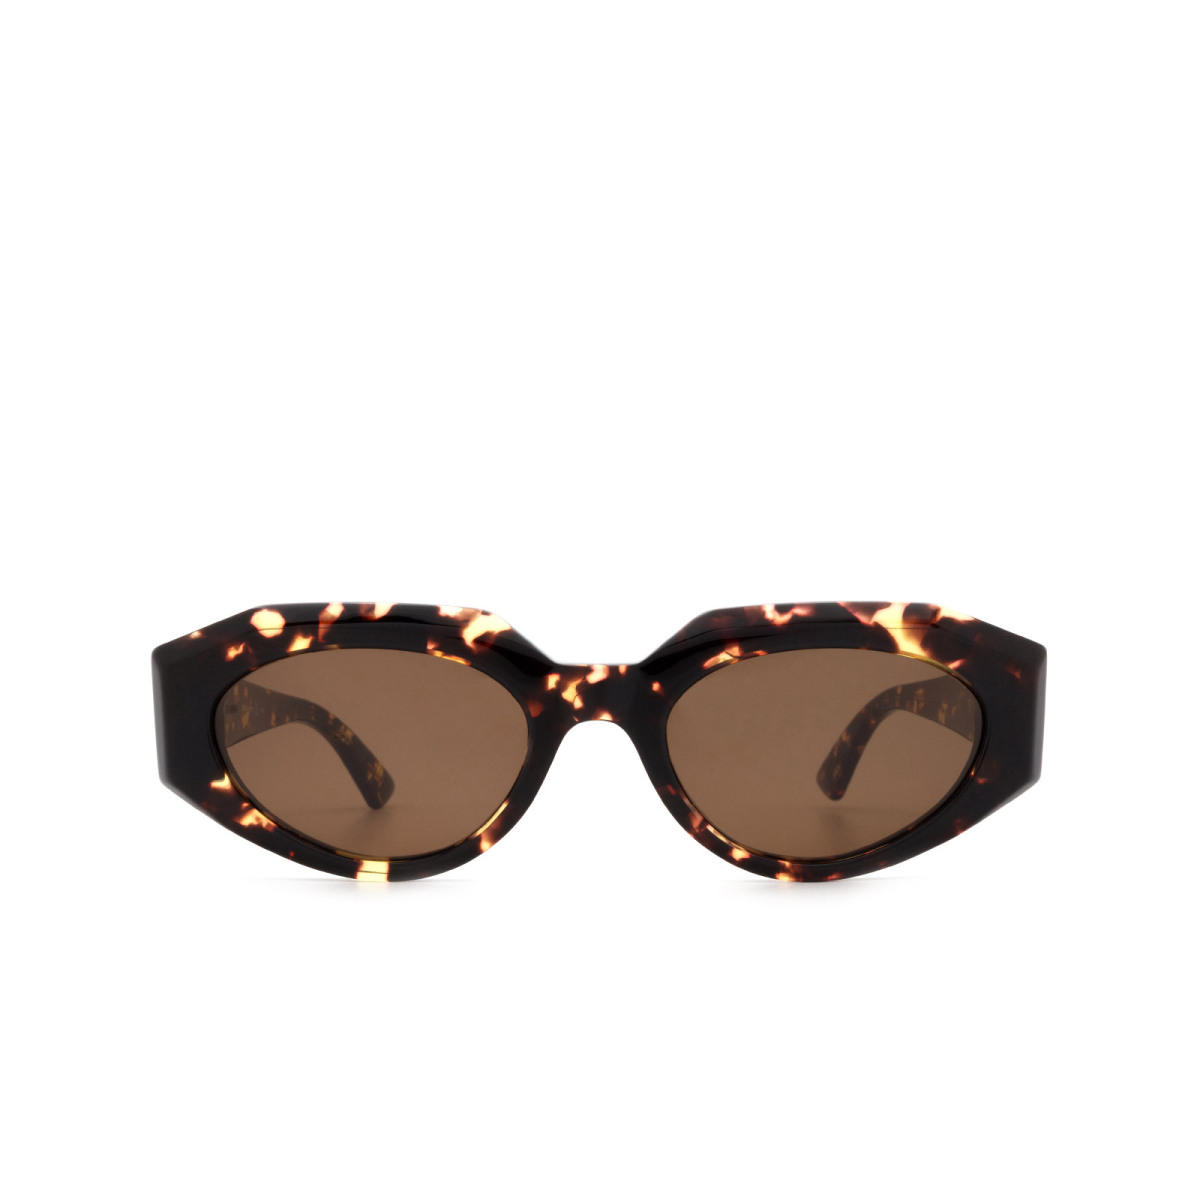 Bottega Veneta® Cat-eye Sunglasses: BV1031S color Havana 002.